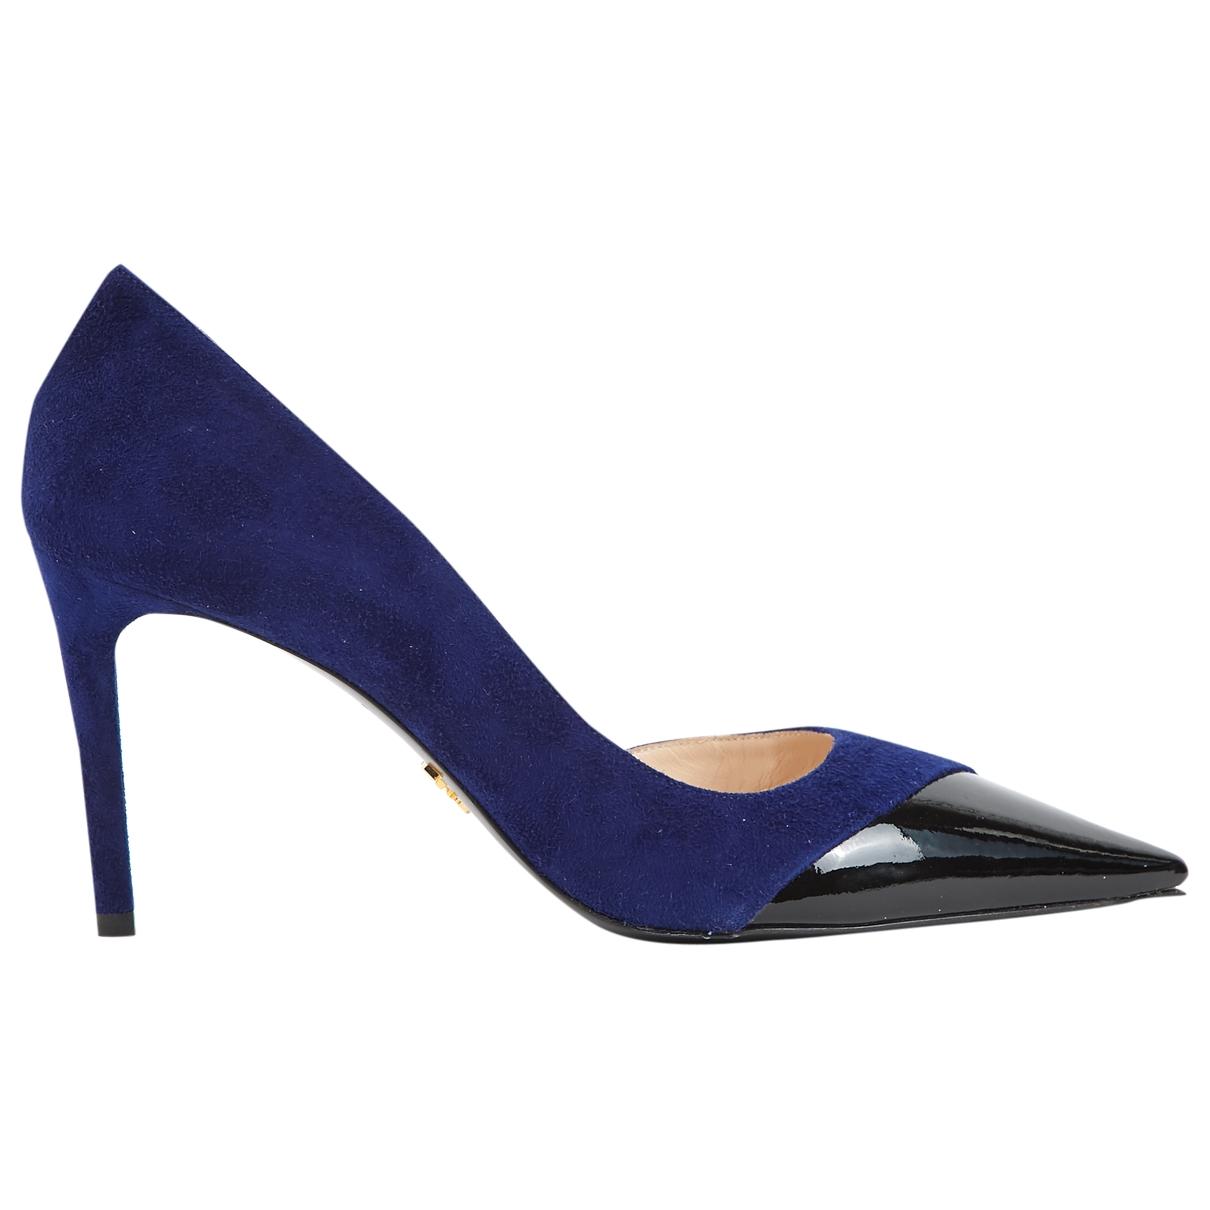 Prada - Escarpins   pour femme en suede - bleu